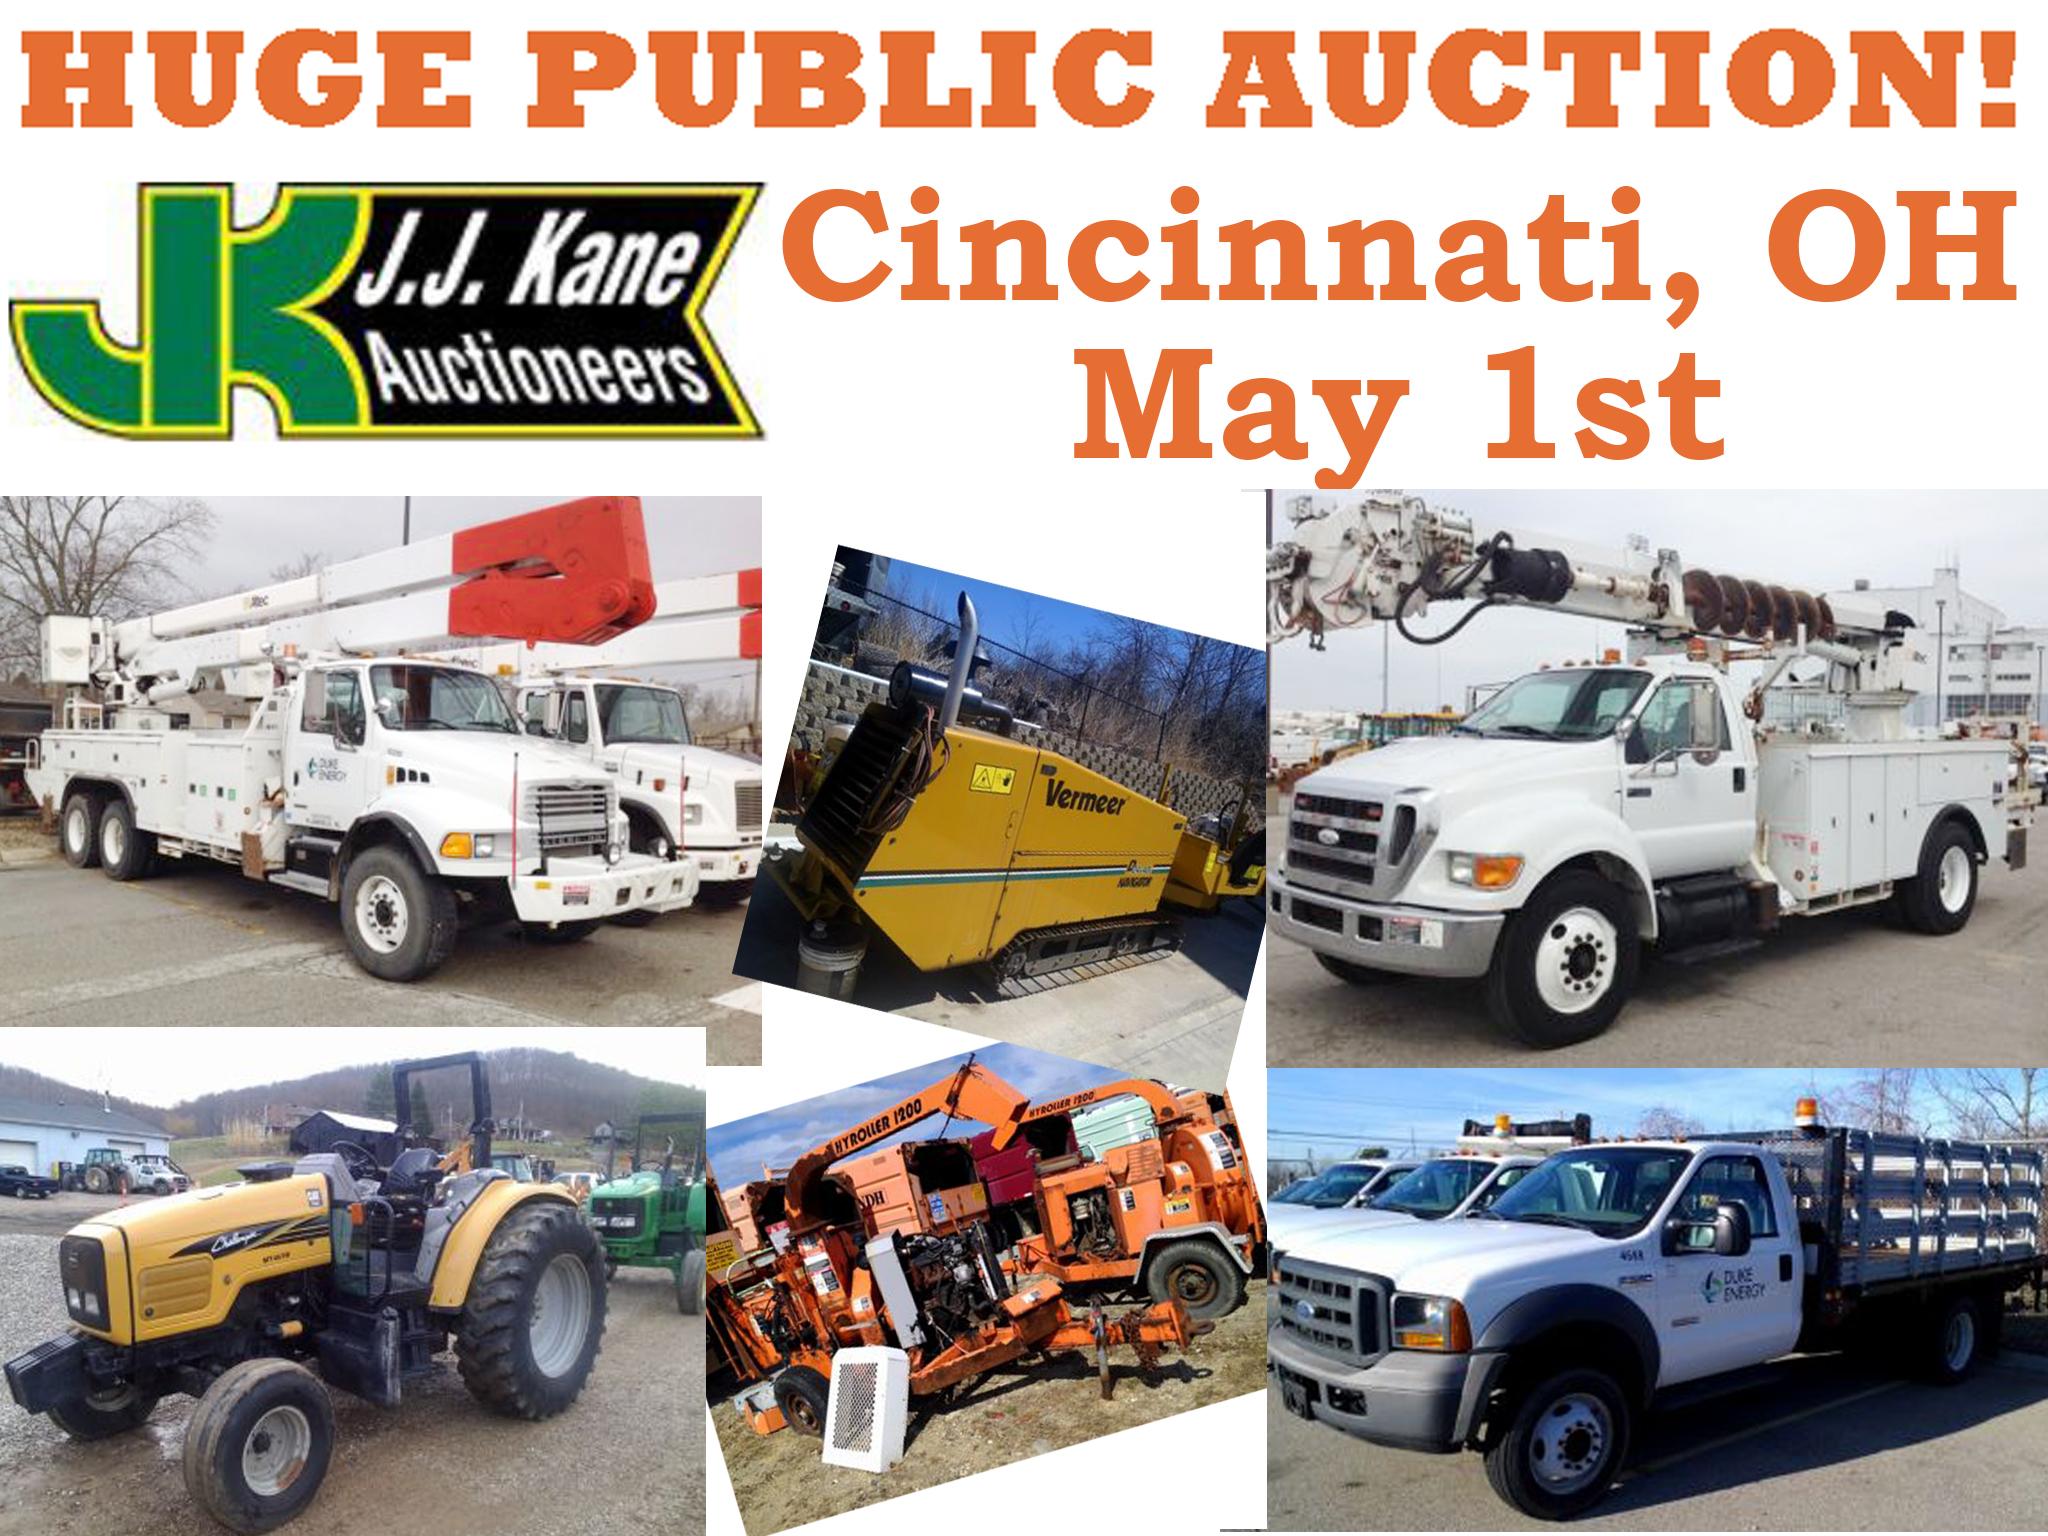 cincinnati oh huge public auction thursday may 1st 2014 fleet equipment from duke energy. Black Bedroom Furniture Sets. Home Design Ideas